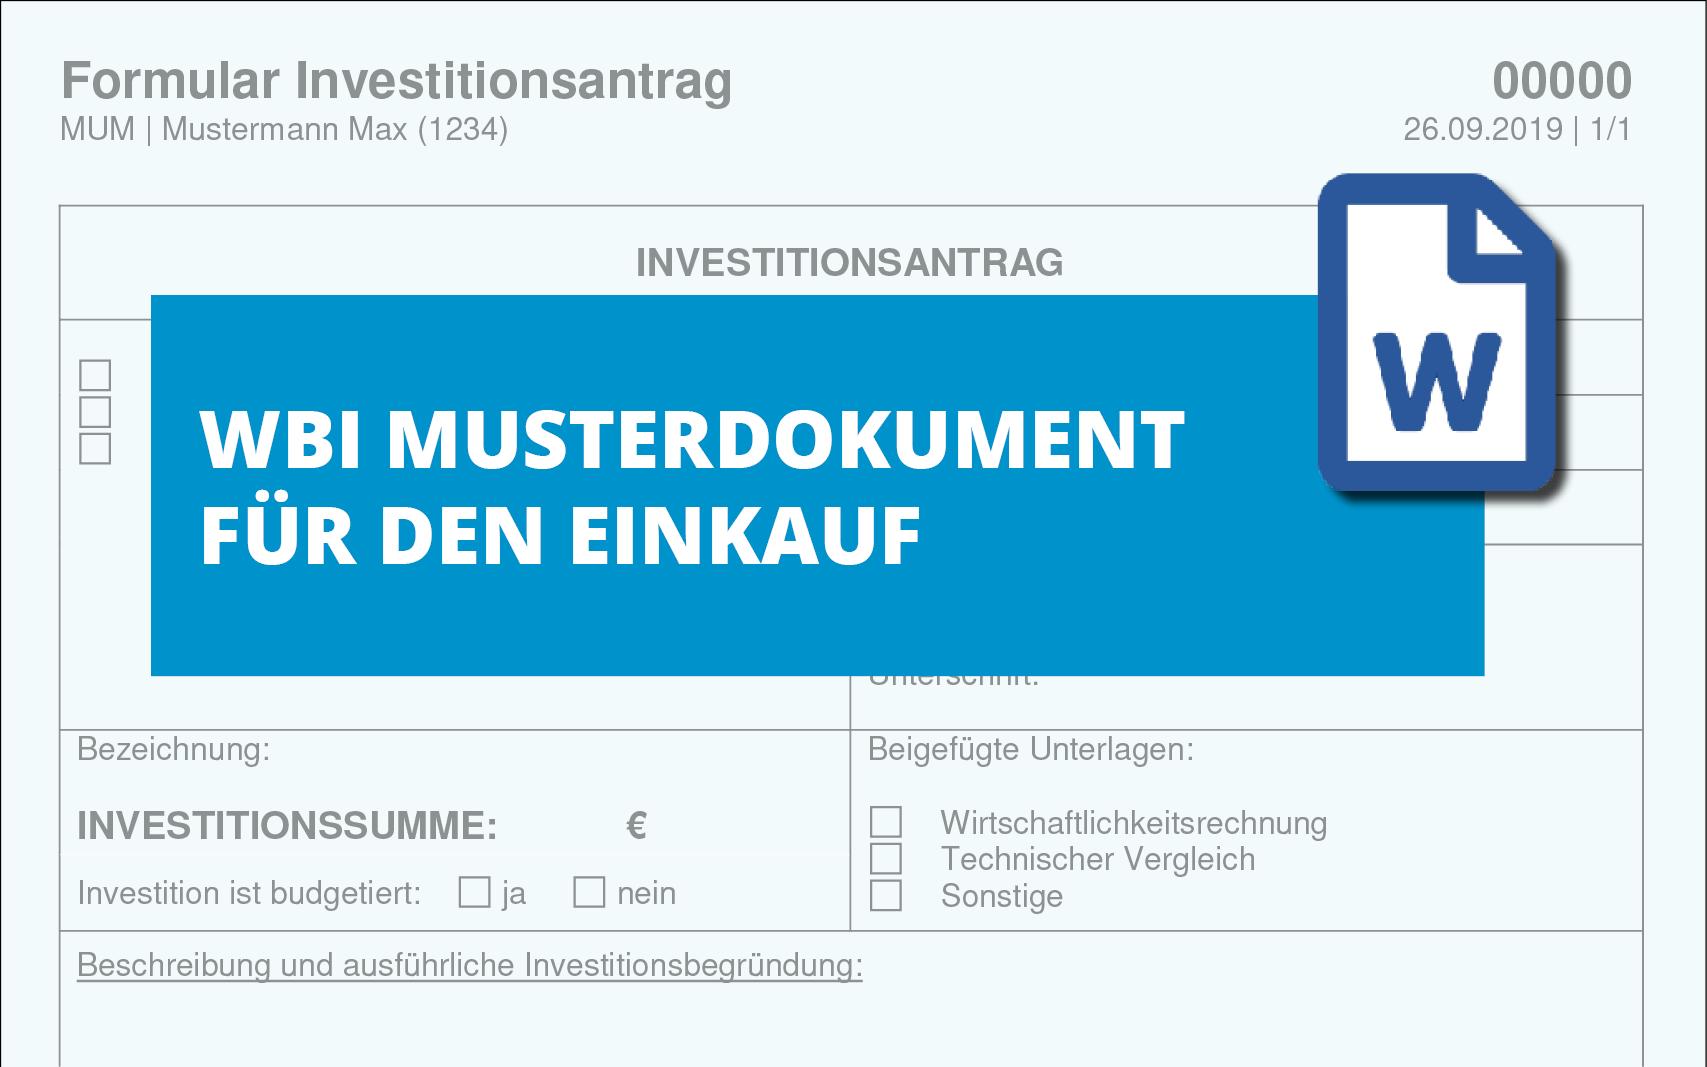 formular-investitionsantrag